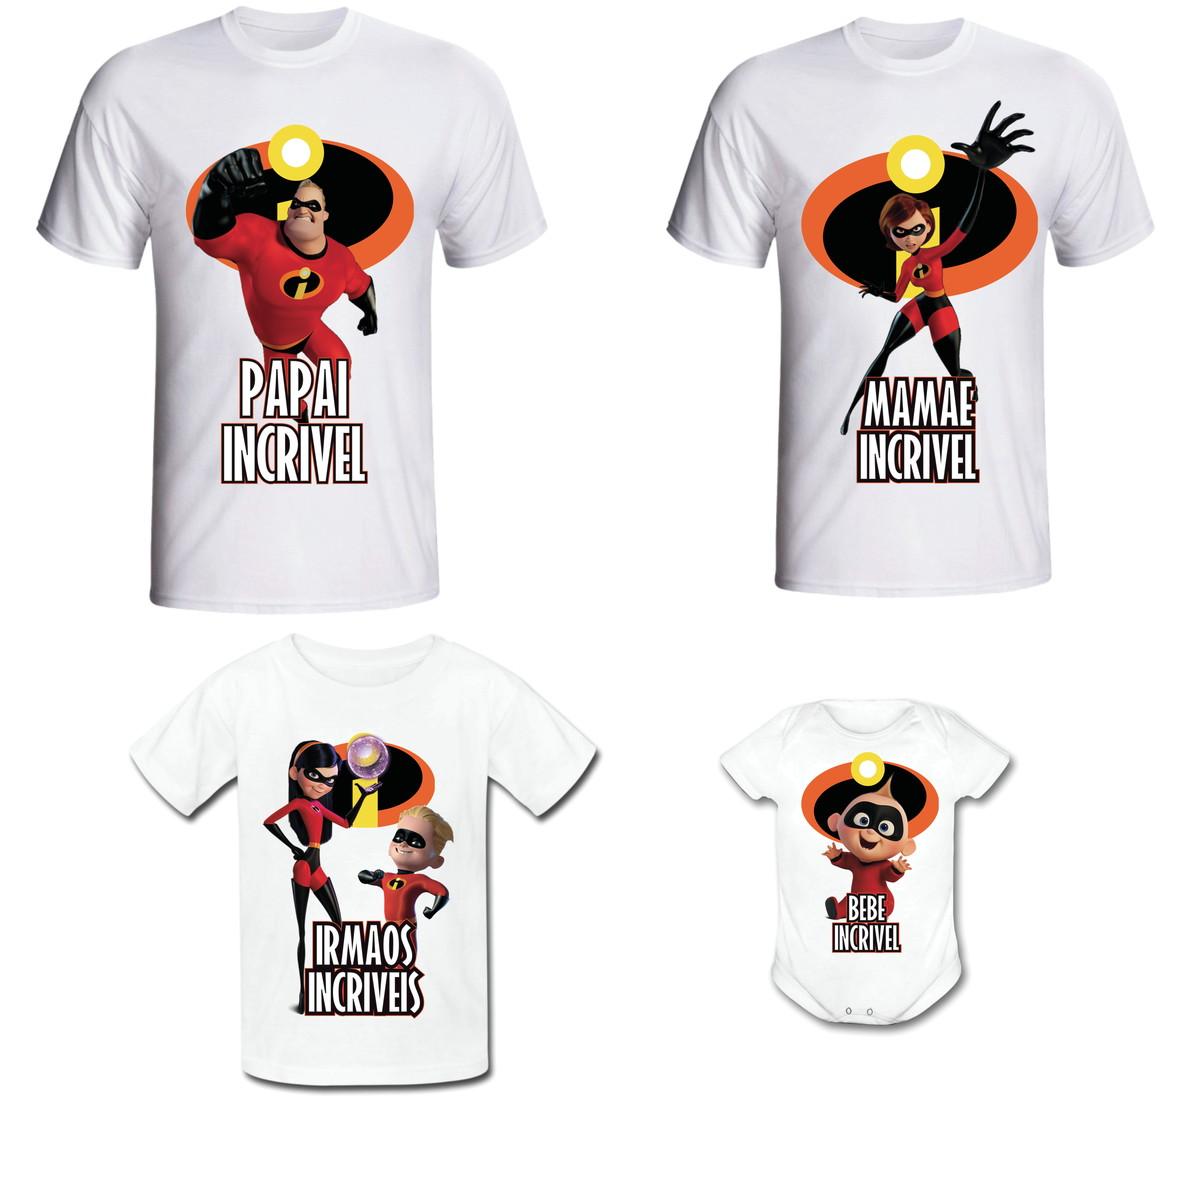 Camiseta Os INCRÍVEIS Kit  03 camisetas + body bebê no Elo7  6c9d9b39869b4